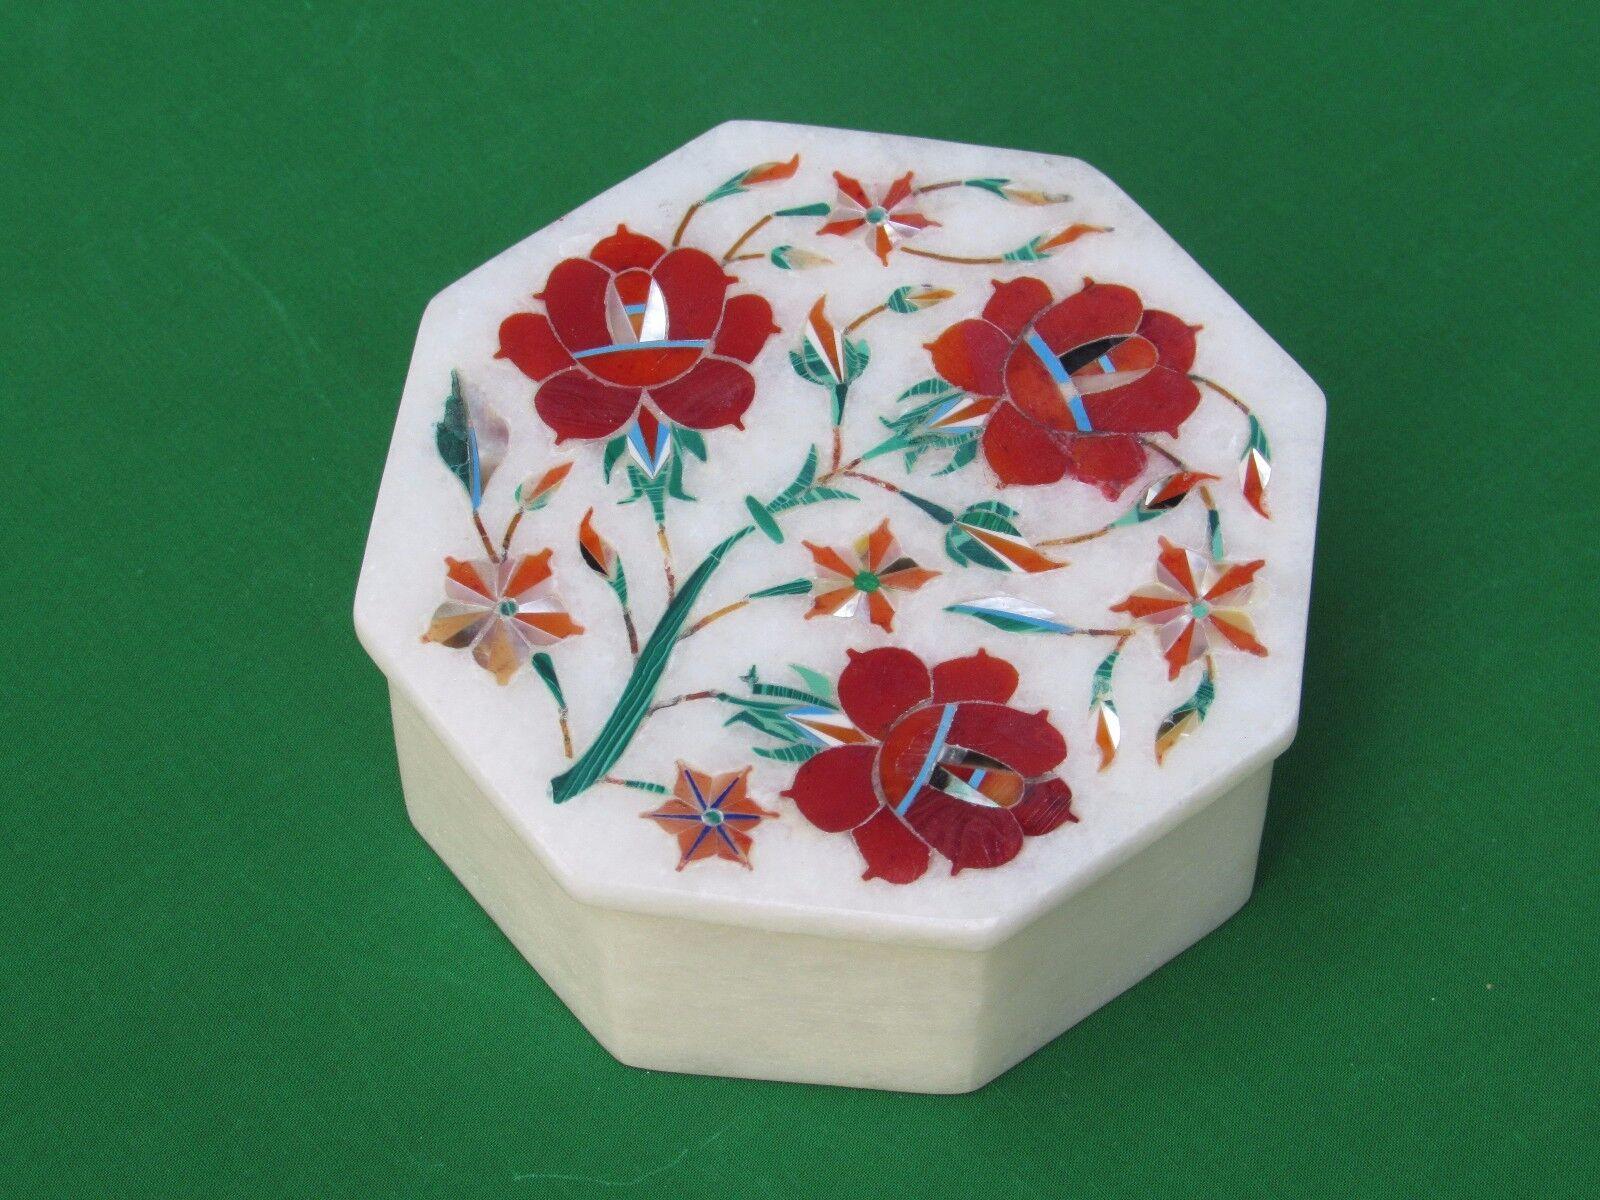 Marble Jewelry Box Pietra dura Inlay Makrana Stone Handmade Crafts and Gifts